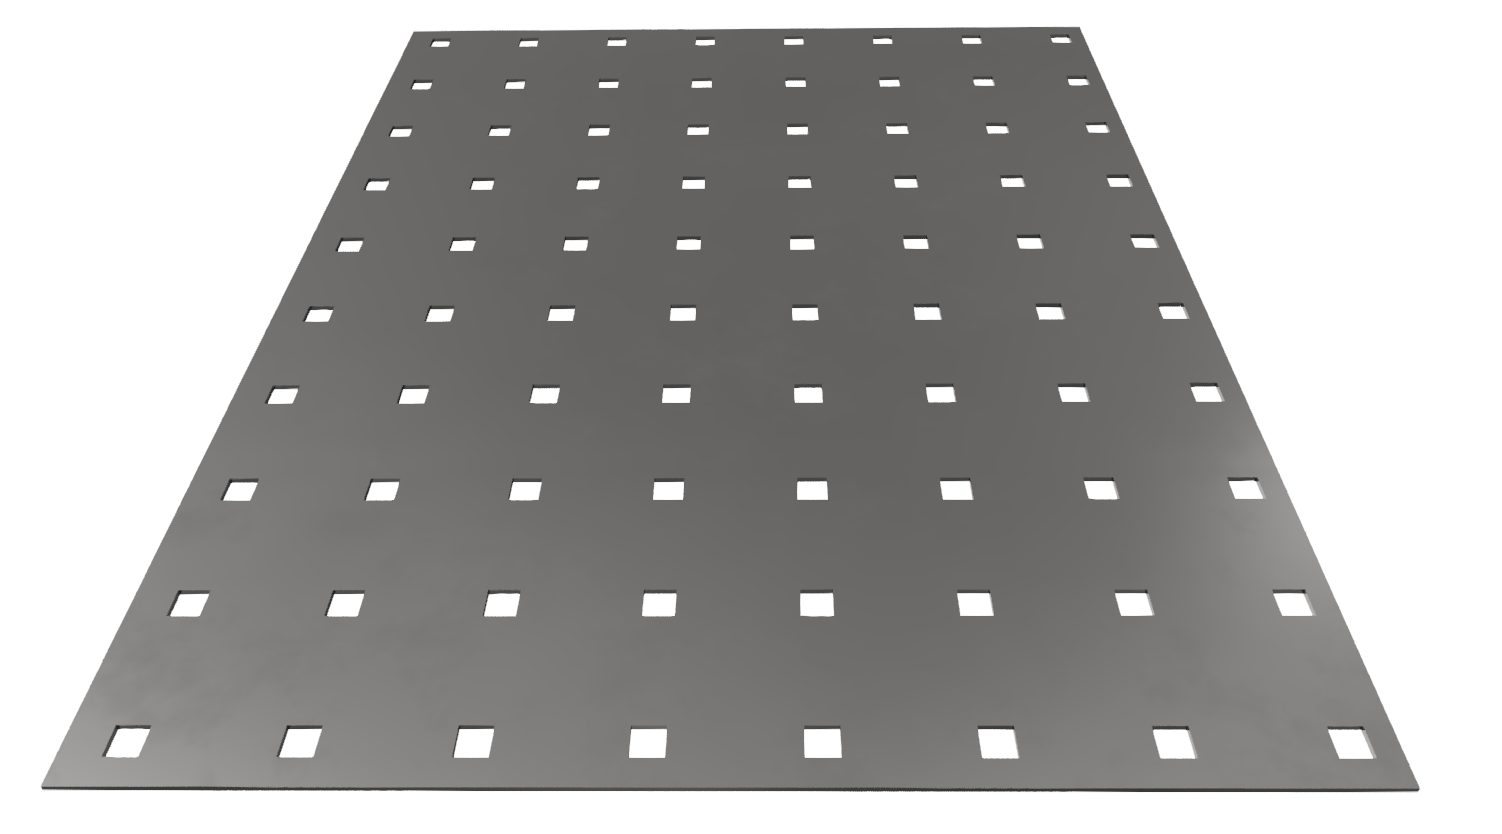 Lochblech ST 1,5mm Qg 10-48, blank